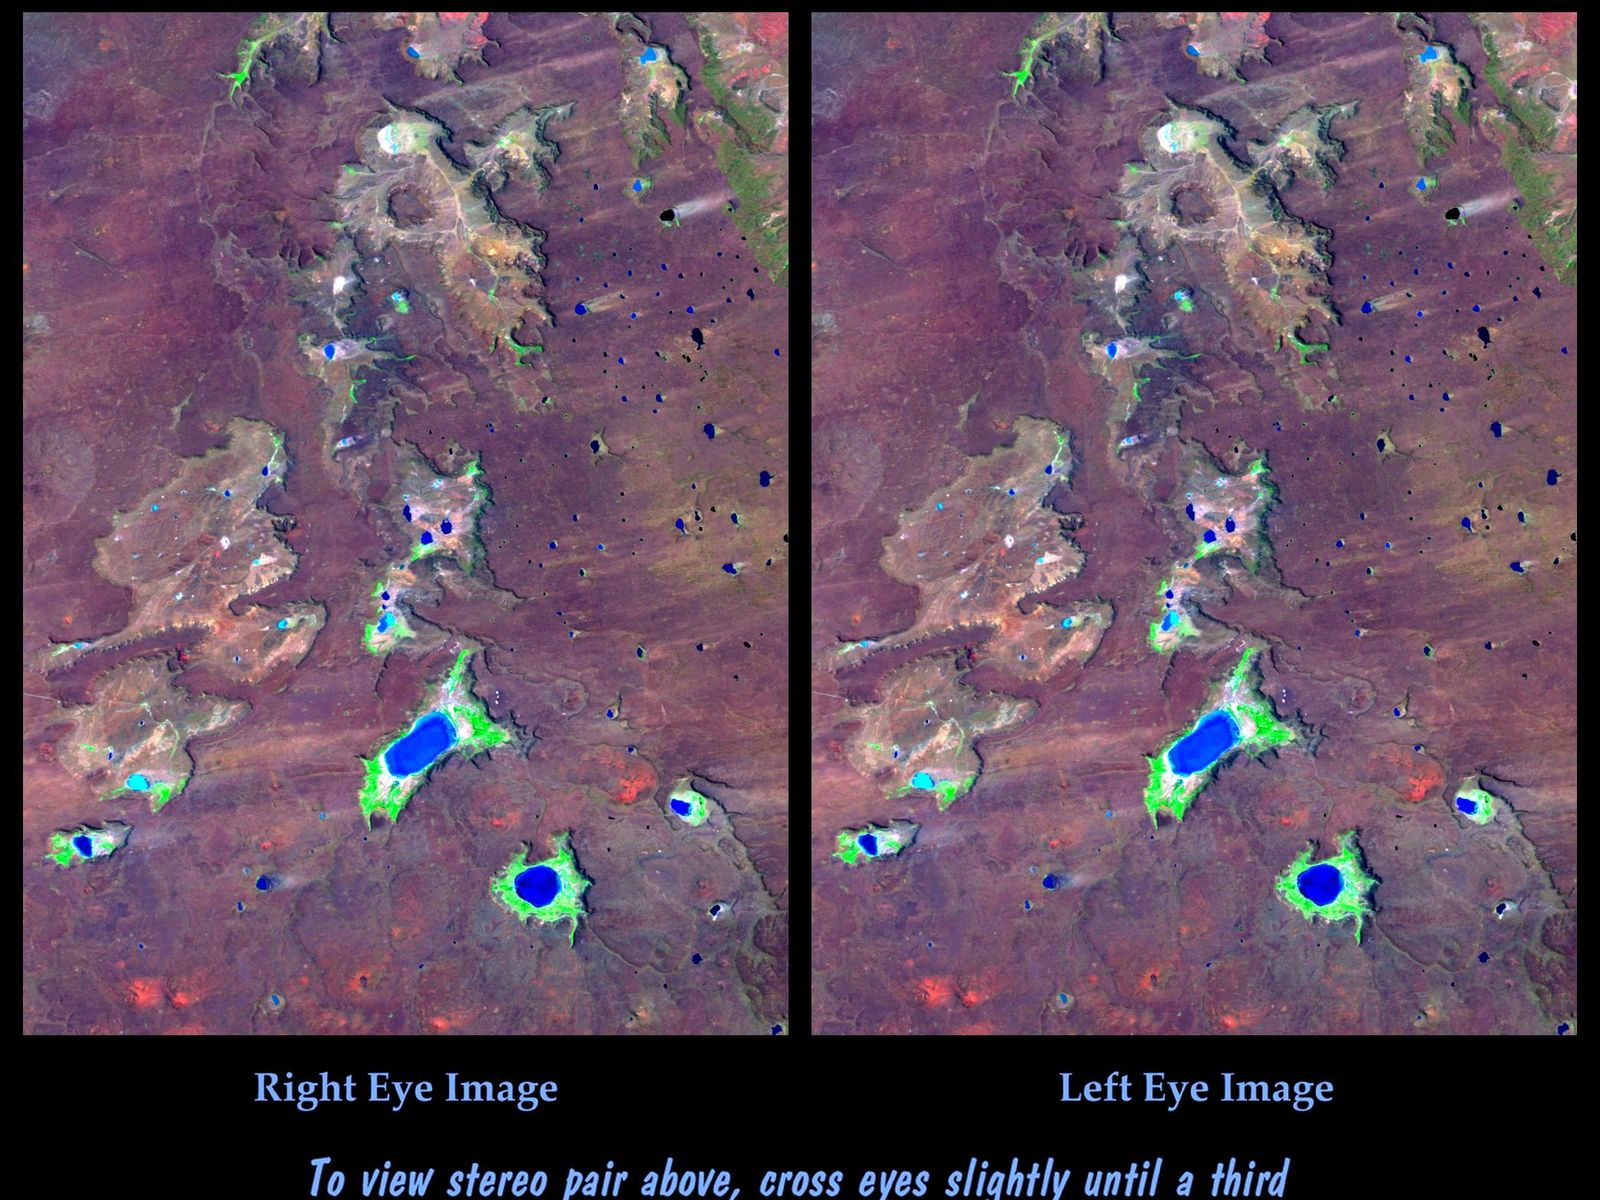 Space Images Srtm Stereo Pair Meseta De Somuncura Patagonia Argentina